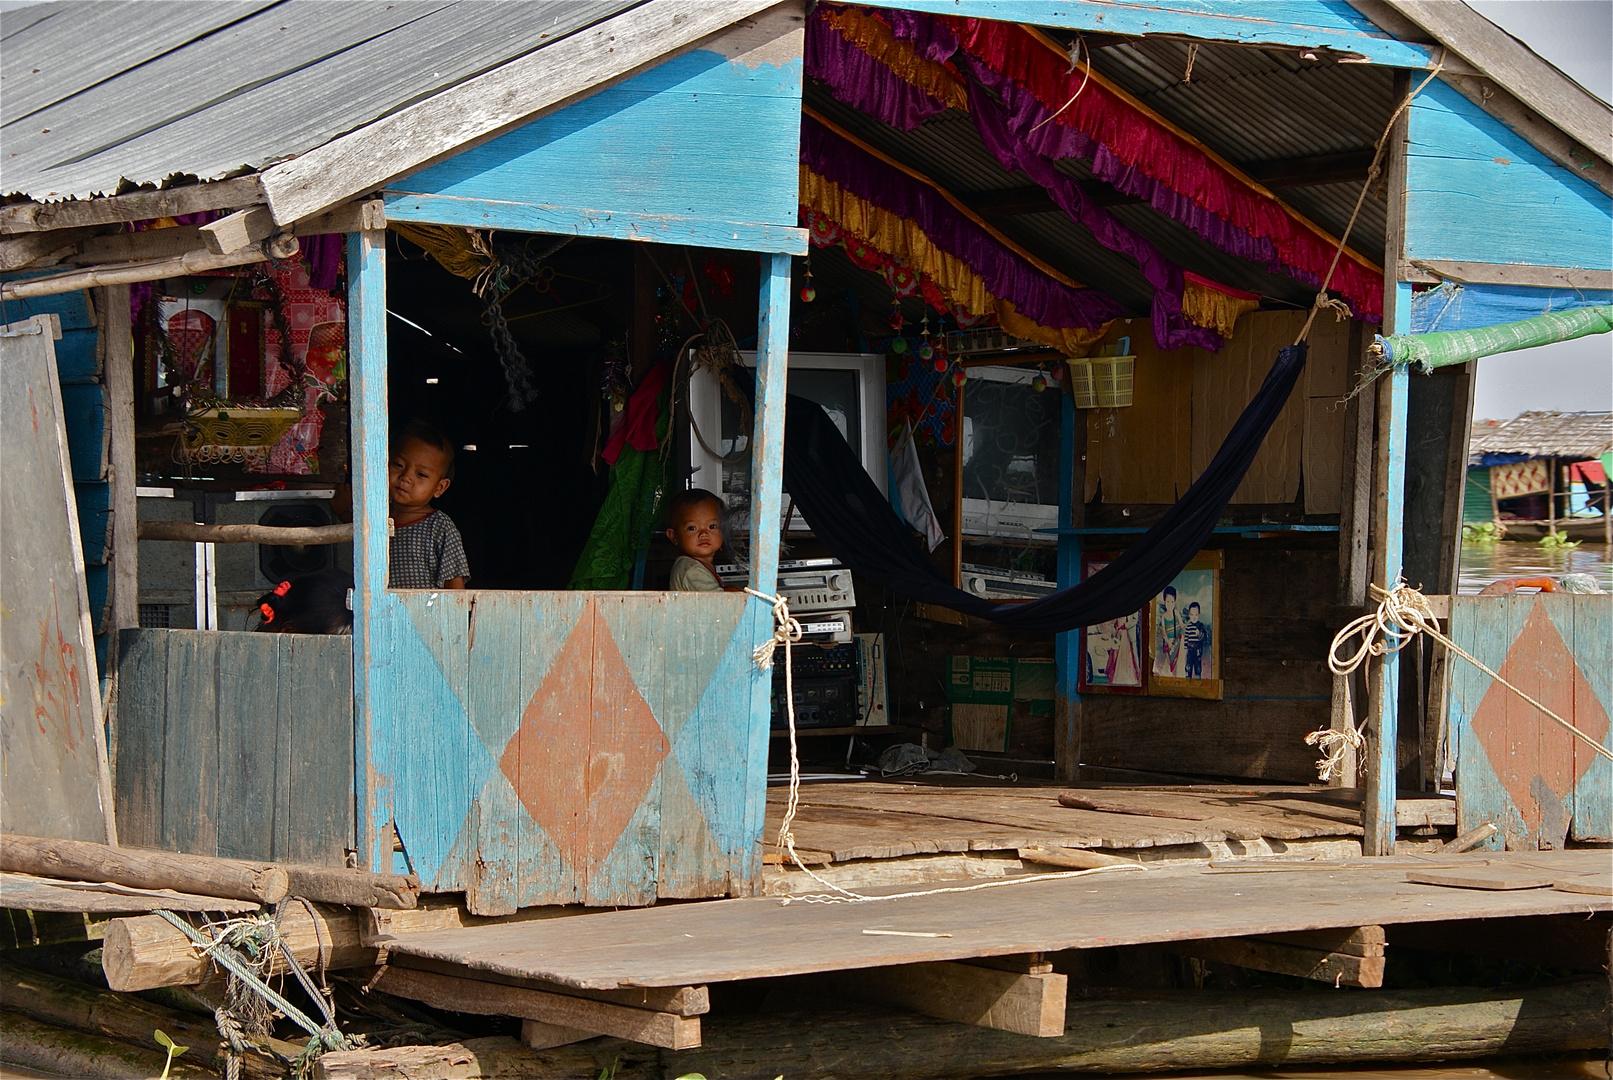 kuckkuck ;-), tonle sap, cambodia 2010